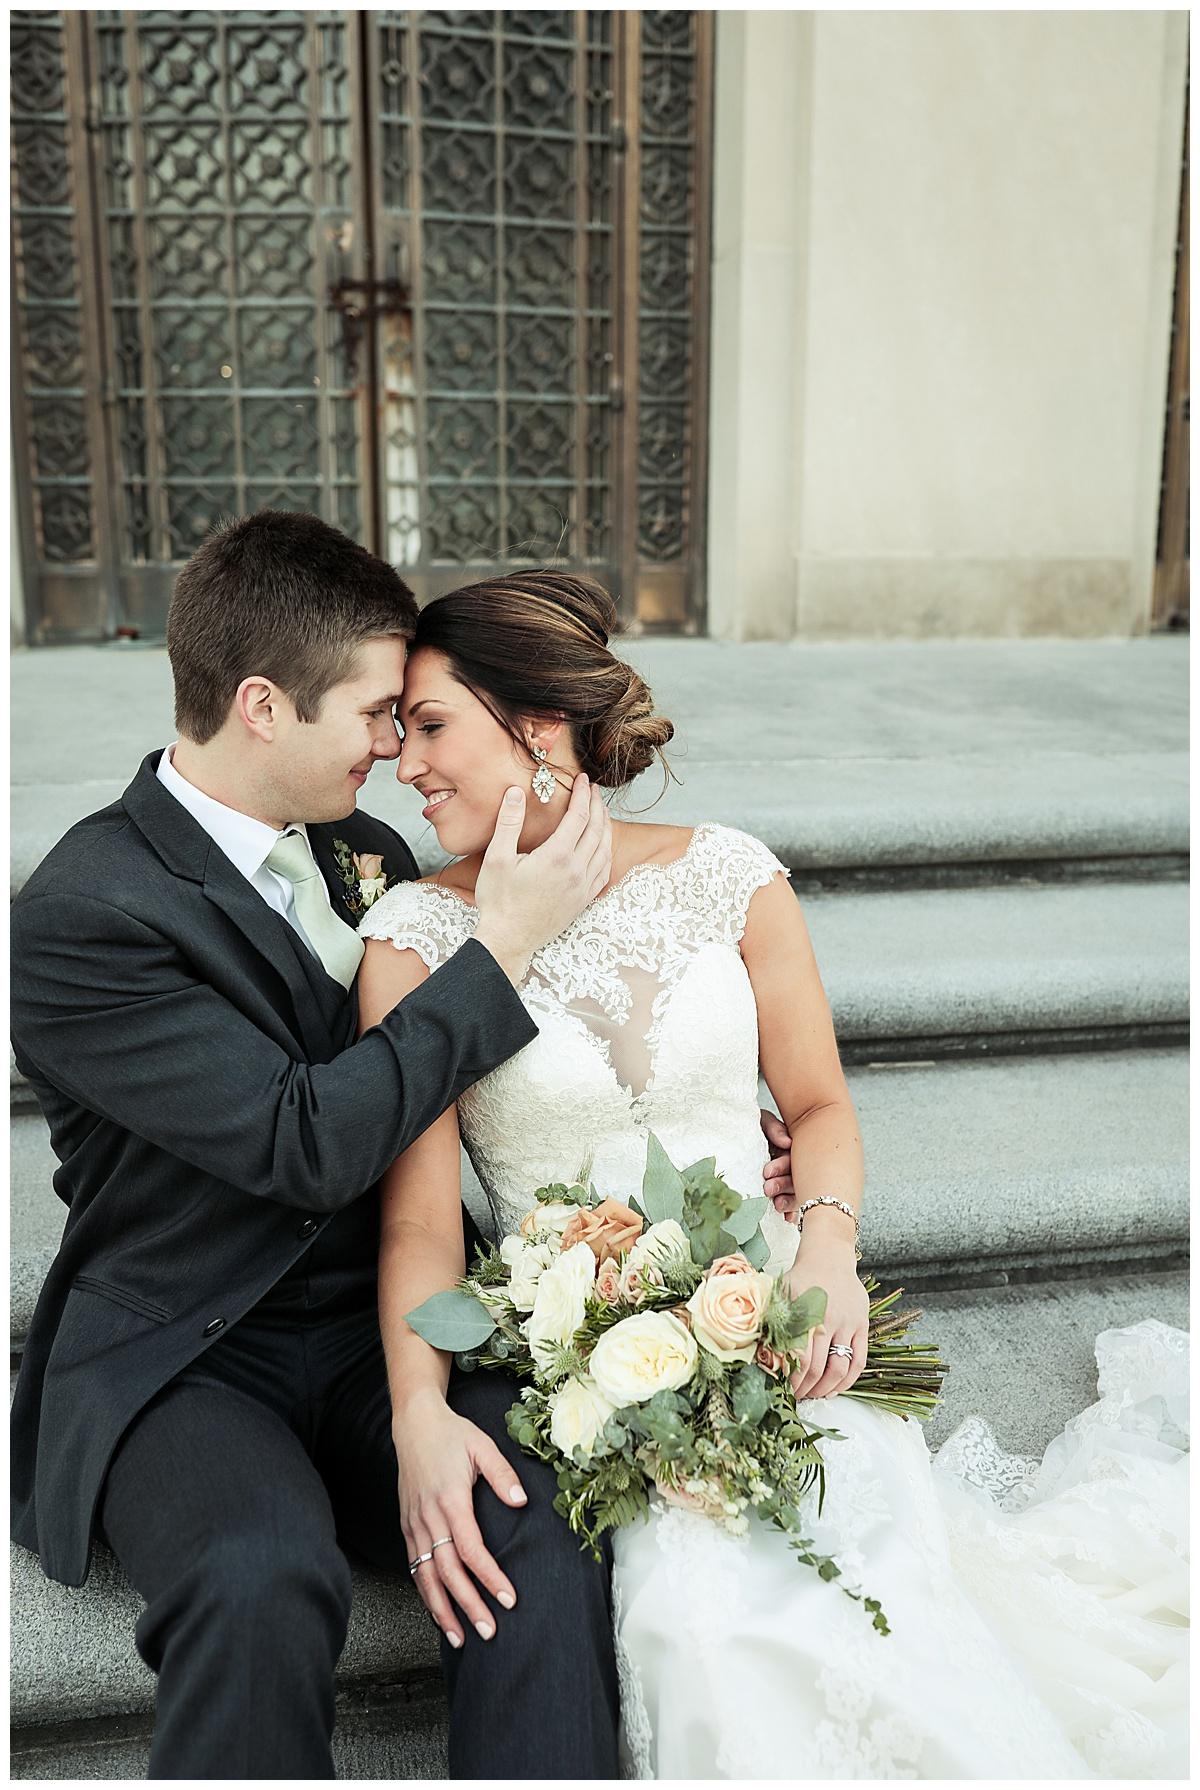 INDUSTRY_Indianapolis_Meghan Harrison Wedding Photography_0044.jpg